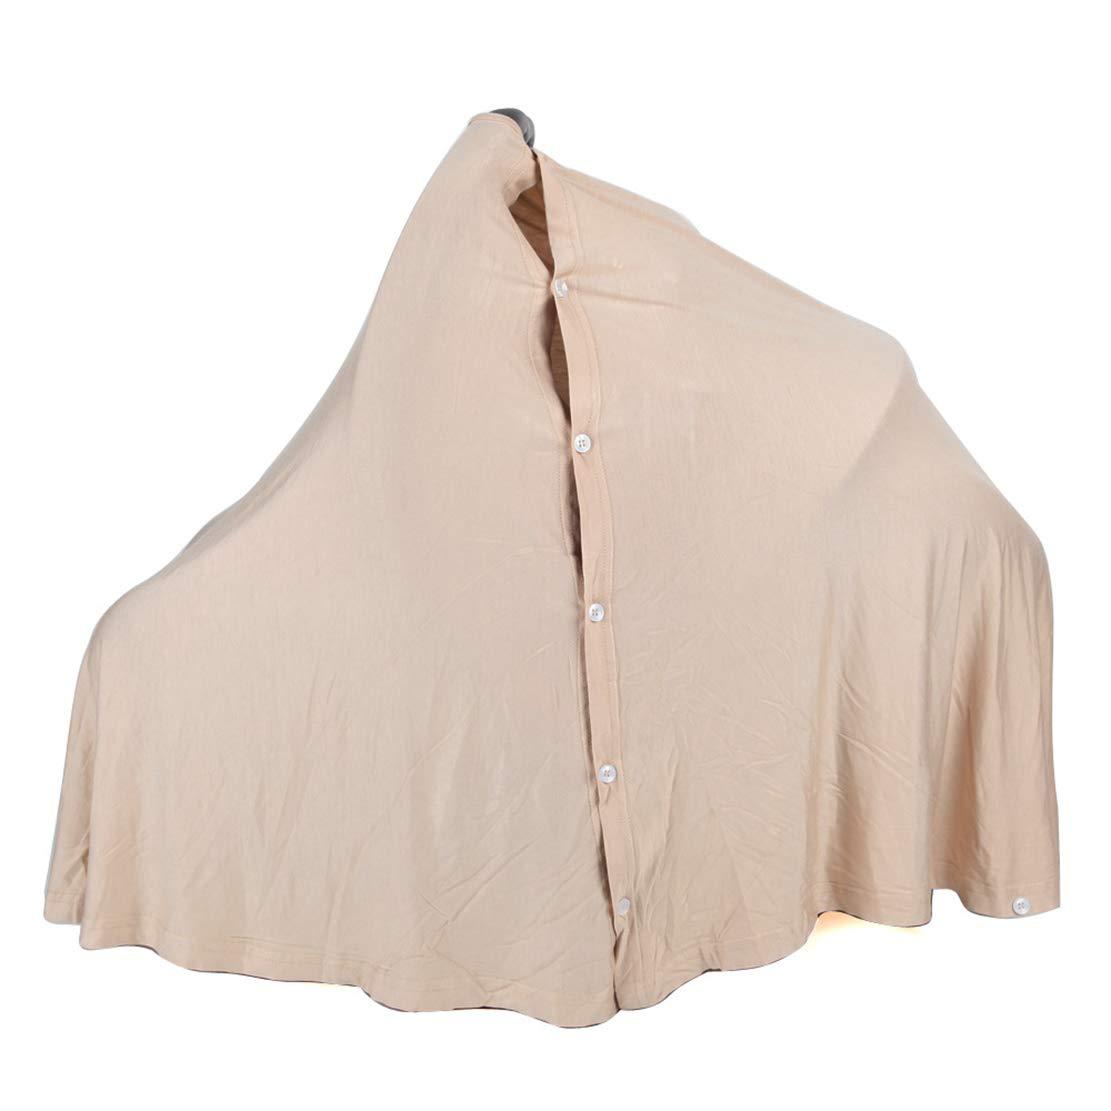 Manta de Lactancia enfermer/ía Pa/ñuelo de Lactancia Cubierta del Cochecito de Beb/é Pa/ñuelo de la bufanda de la Lactancia Chal para beb/és